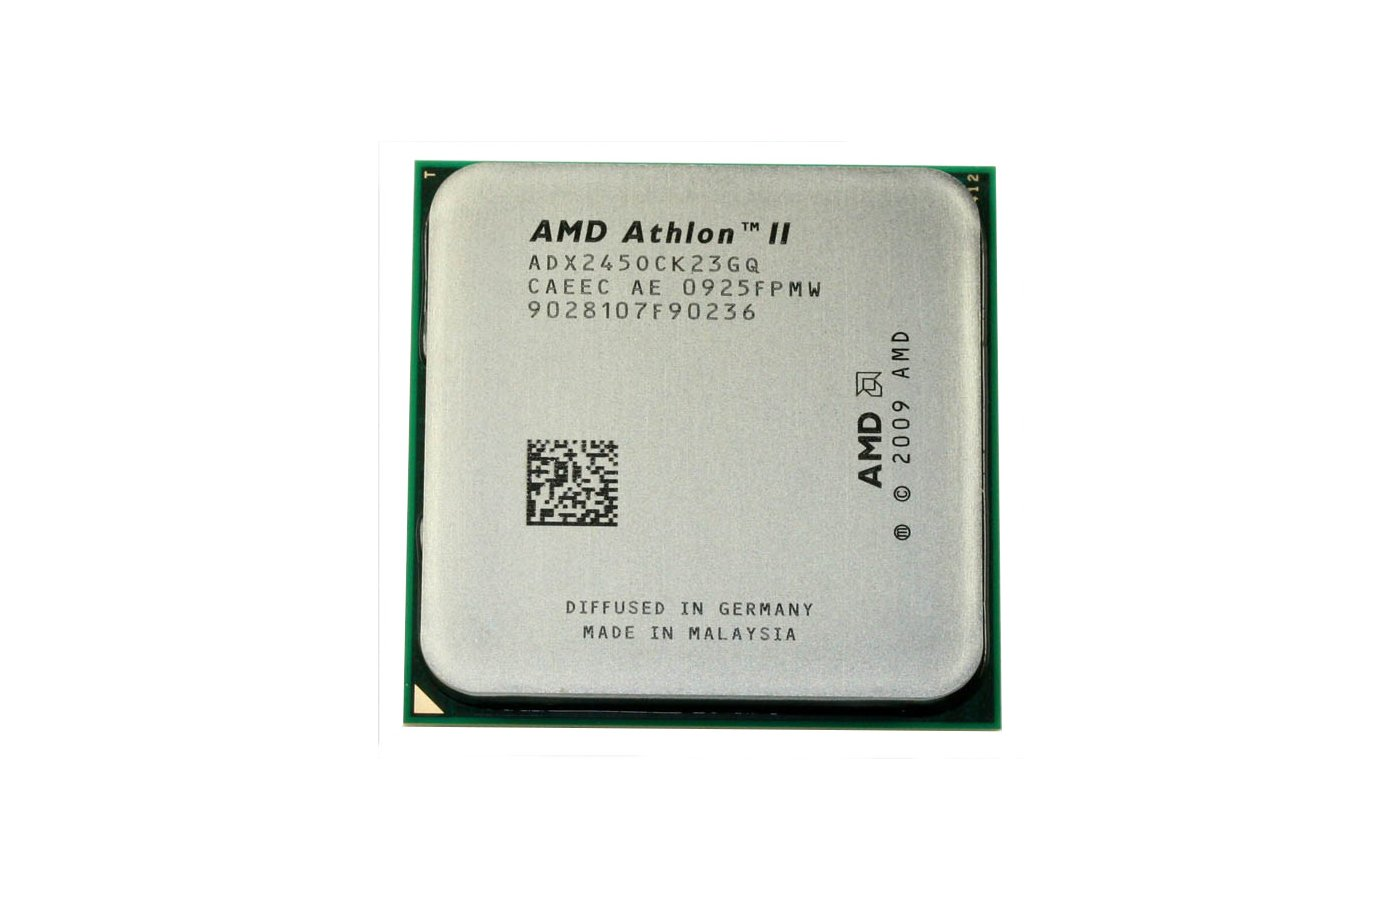 Процессор AMD Athlon II 245 (ADX245OCK23GQ/ADX245OCK23GM) OEM